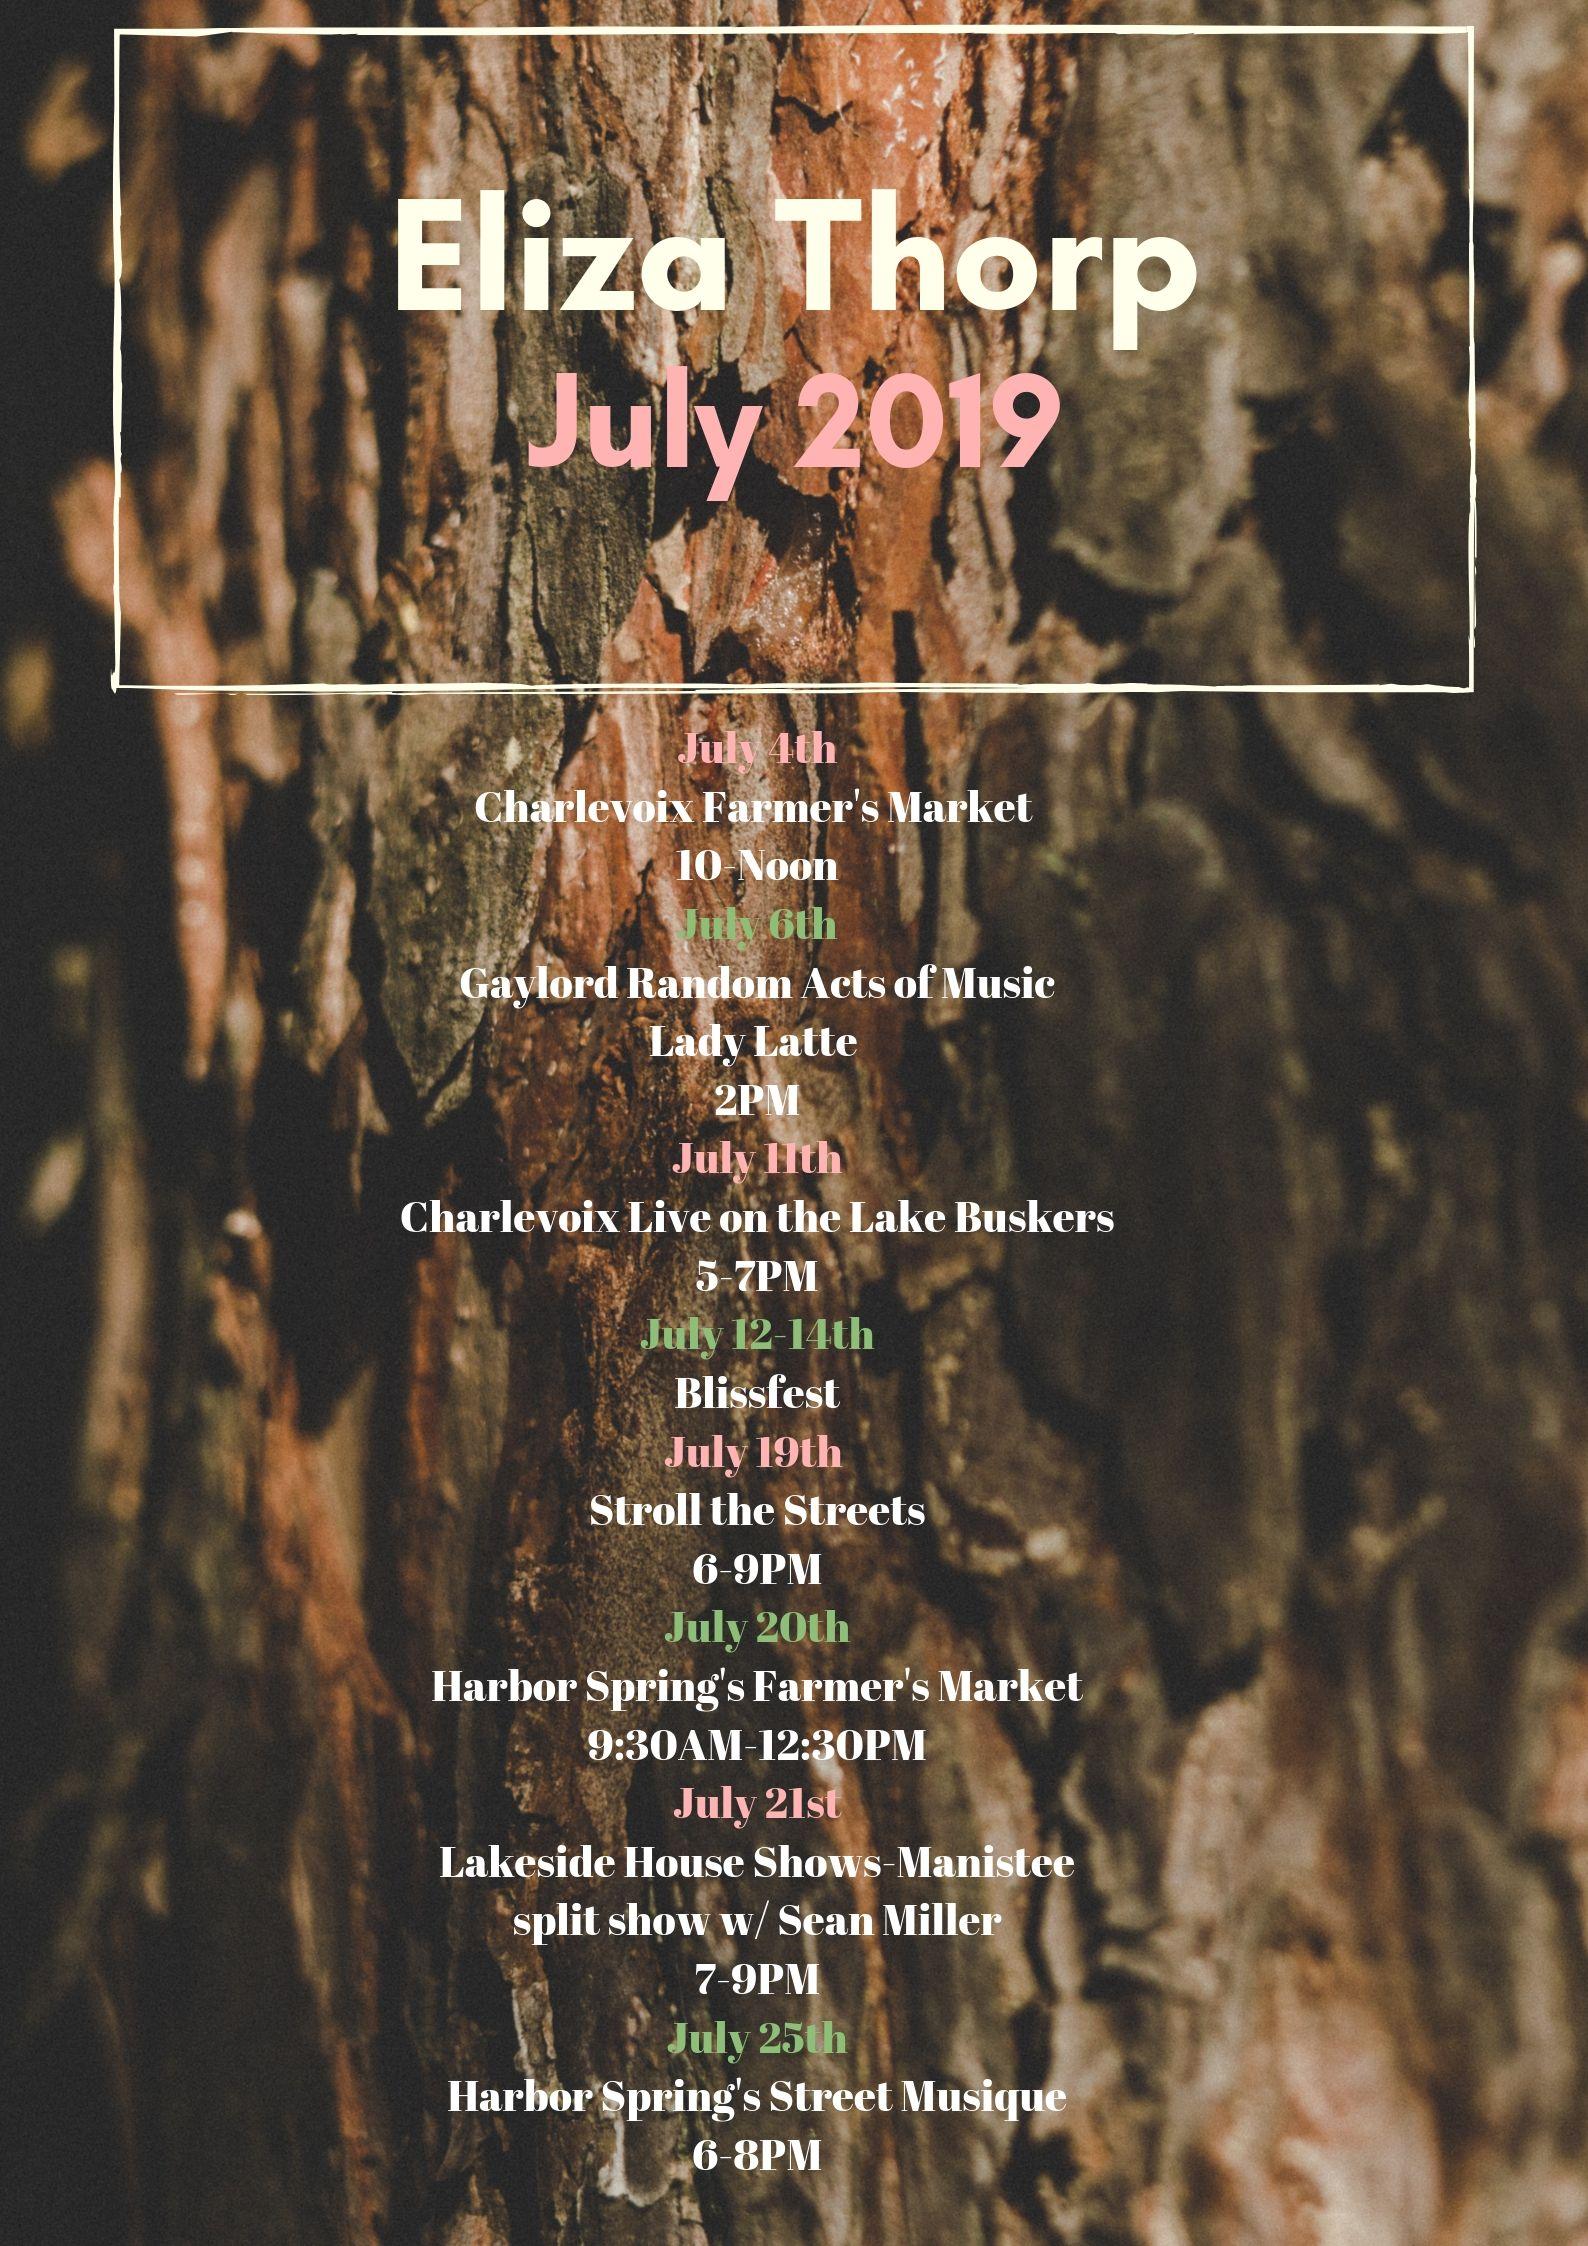 July 2019 SHows.jpg